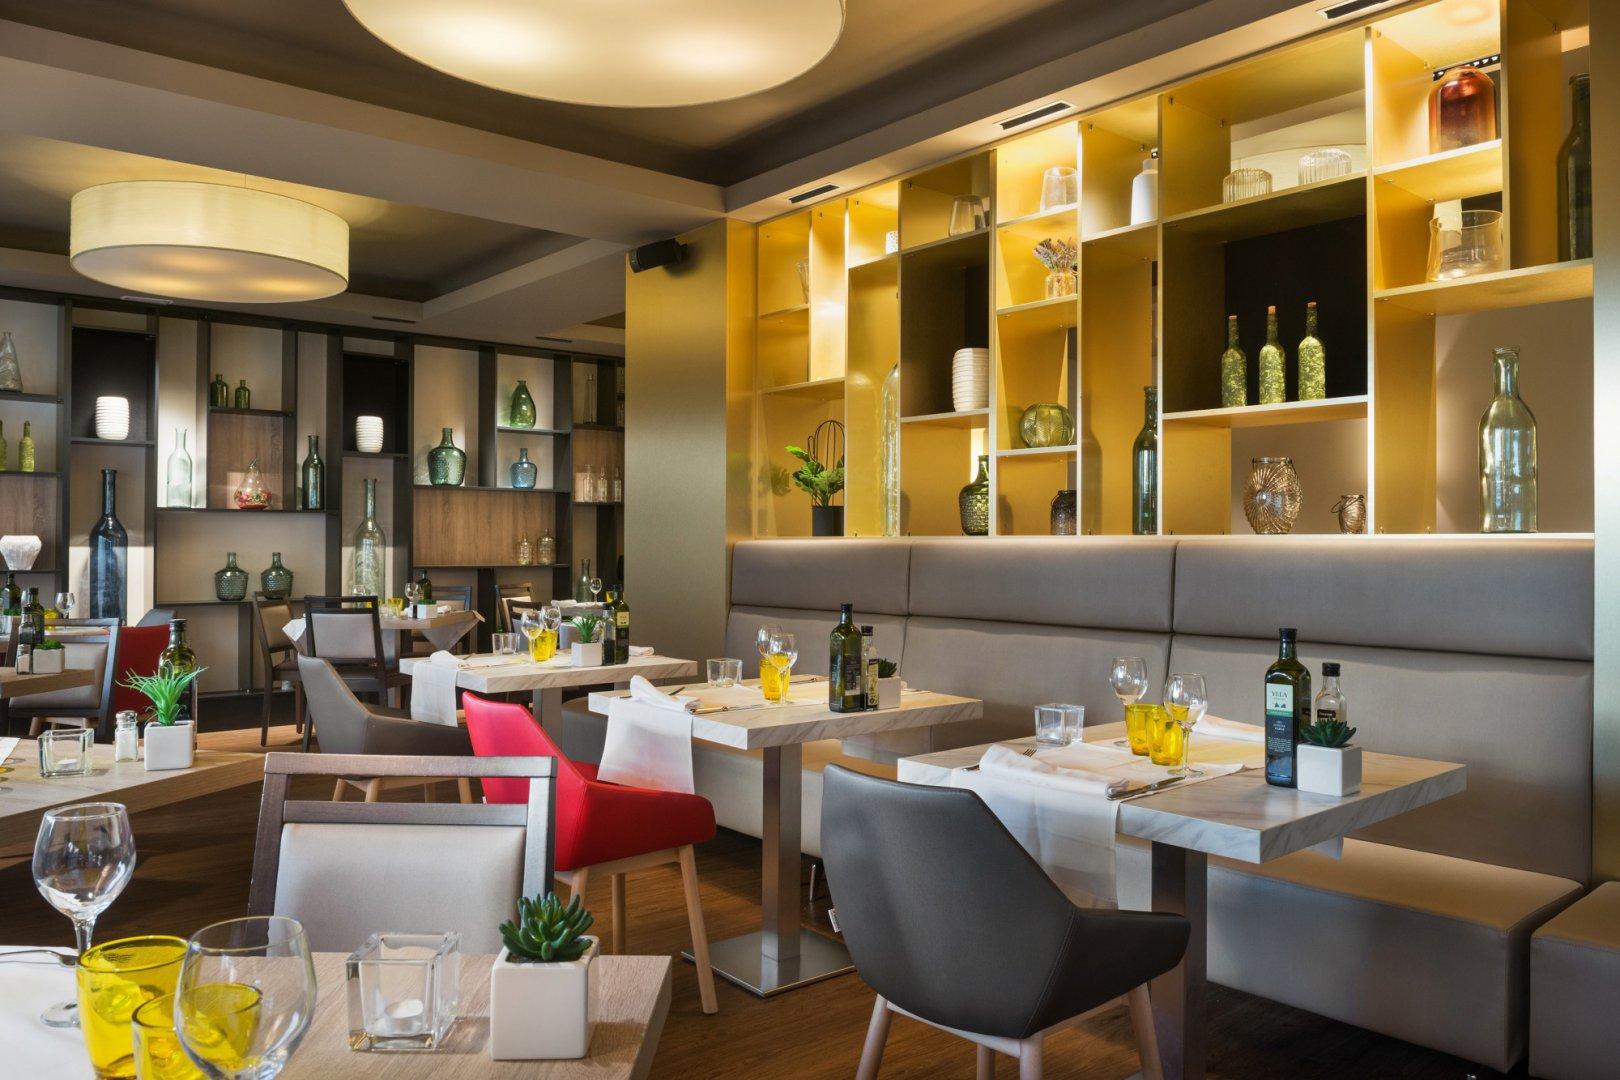 https://www.restaurantronda.com/imagecache/uploads_images_paginas_home_1620x1080_c_dsc-7946.jpg